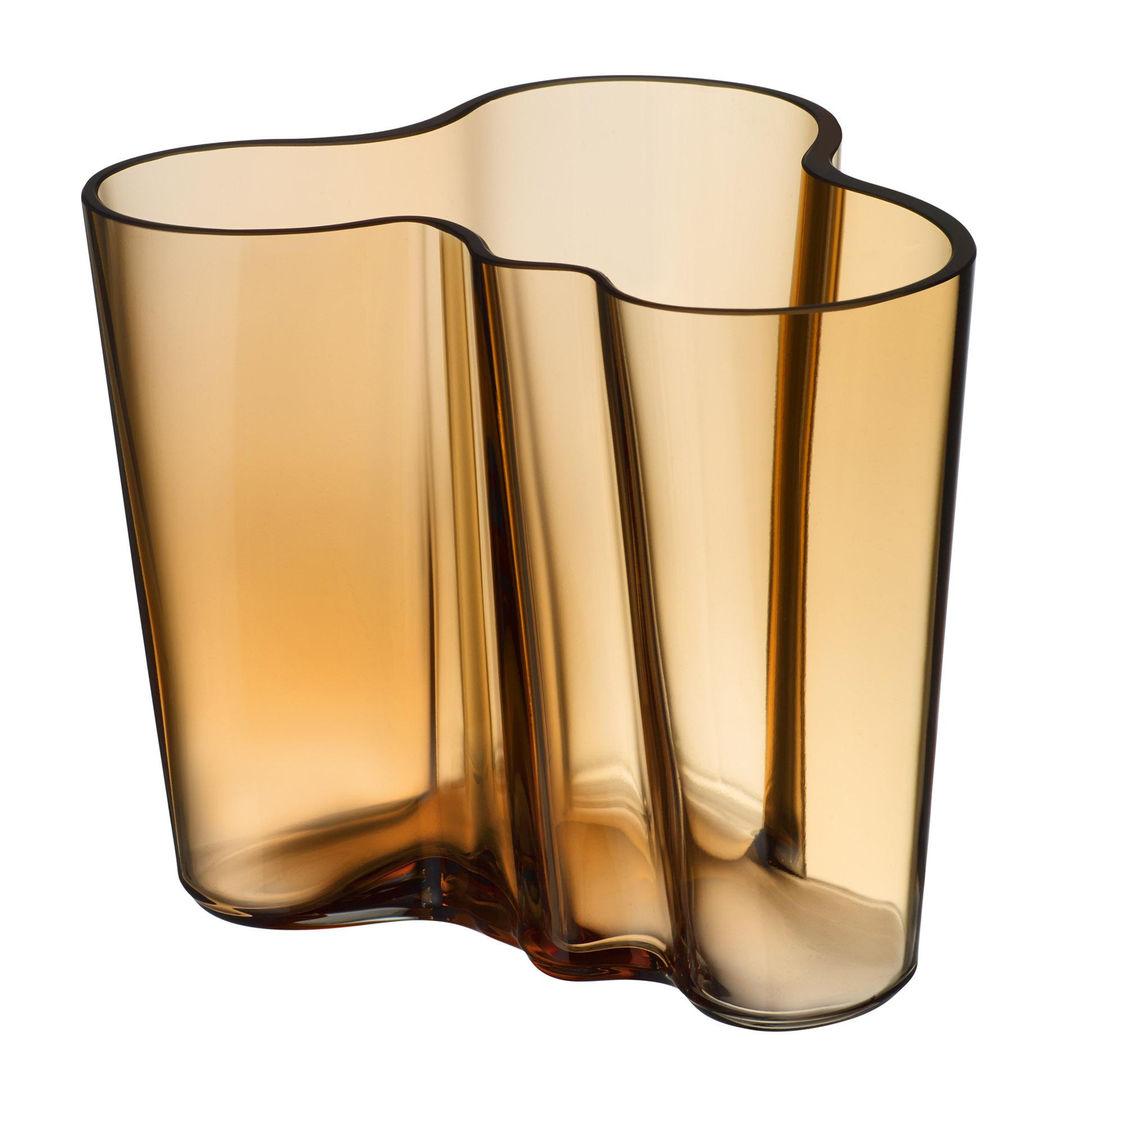 Alvar aalto vase 95mm iittala ambientedirect alvar aalto vase 95mm reviewsmspy